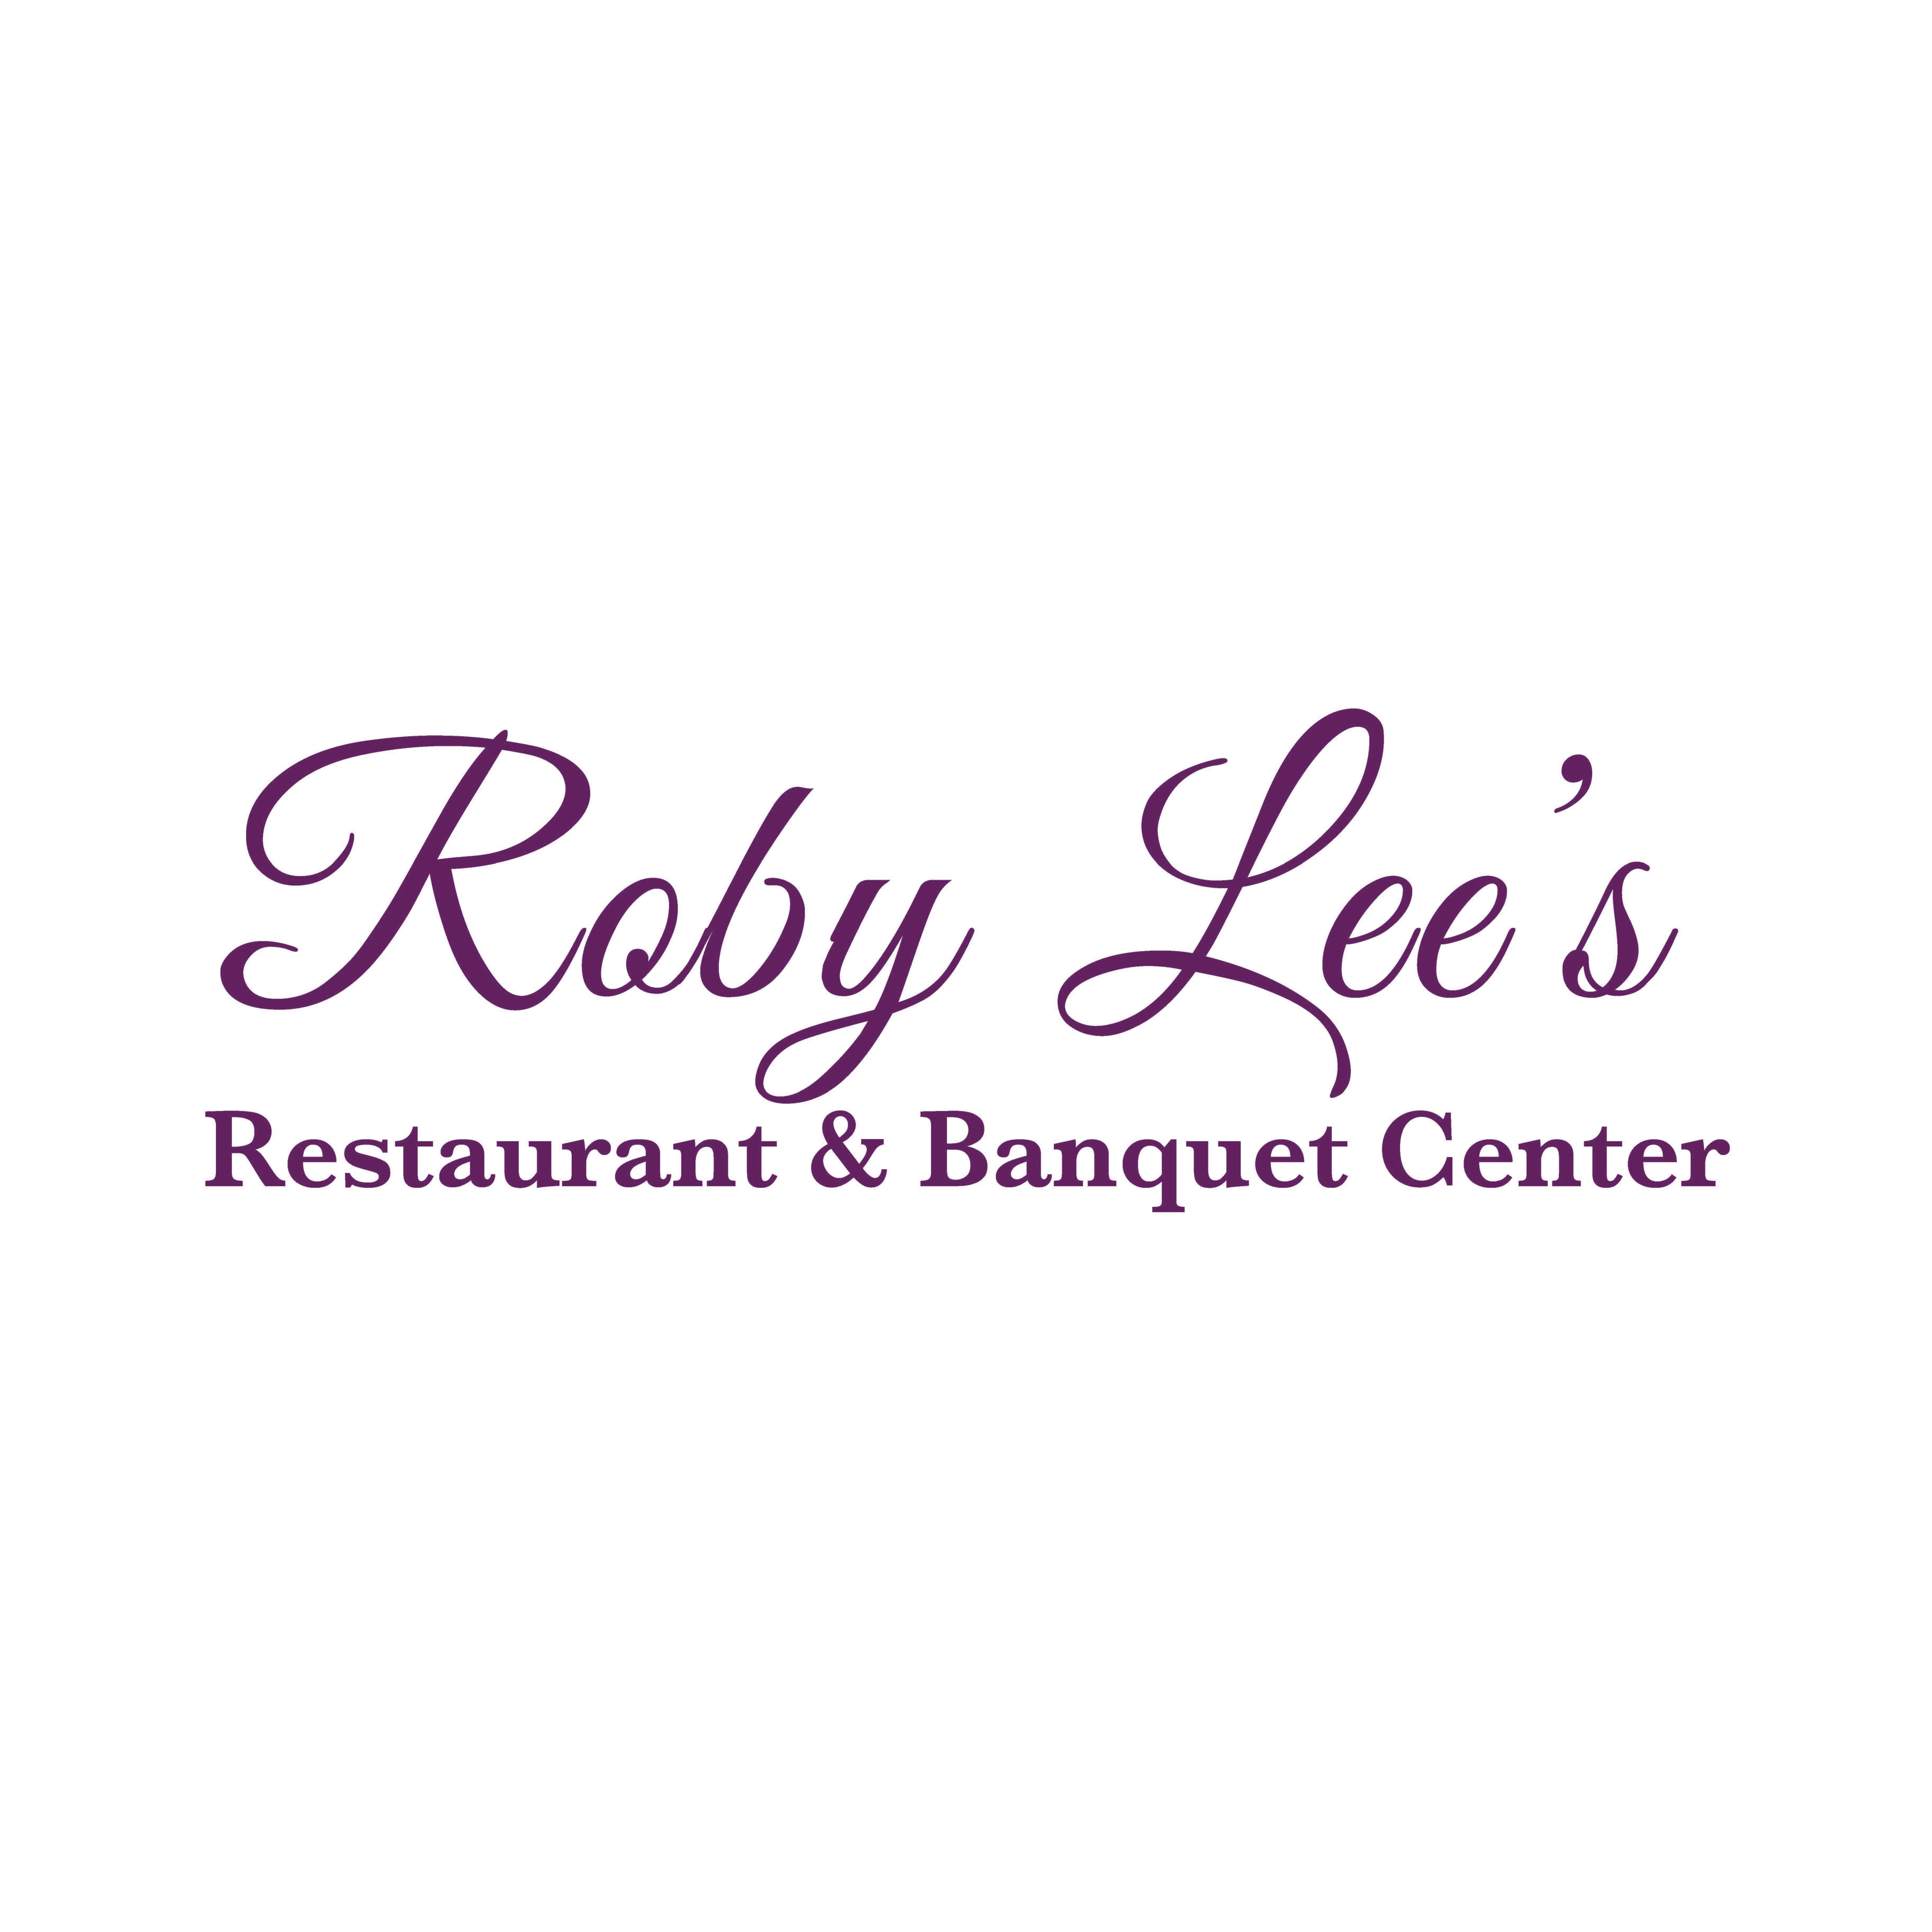 Roby  Lee's Restaurant & Banquet Center